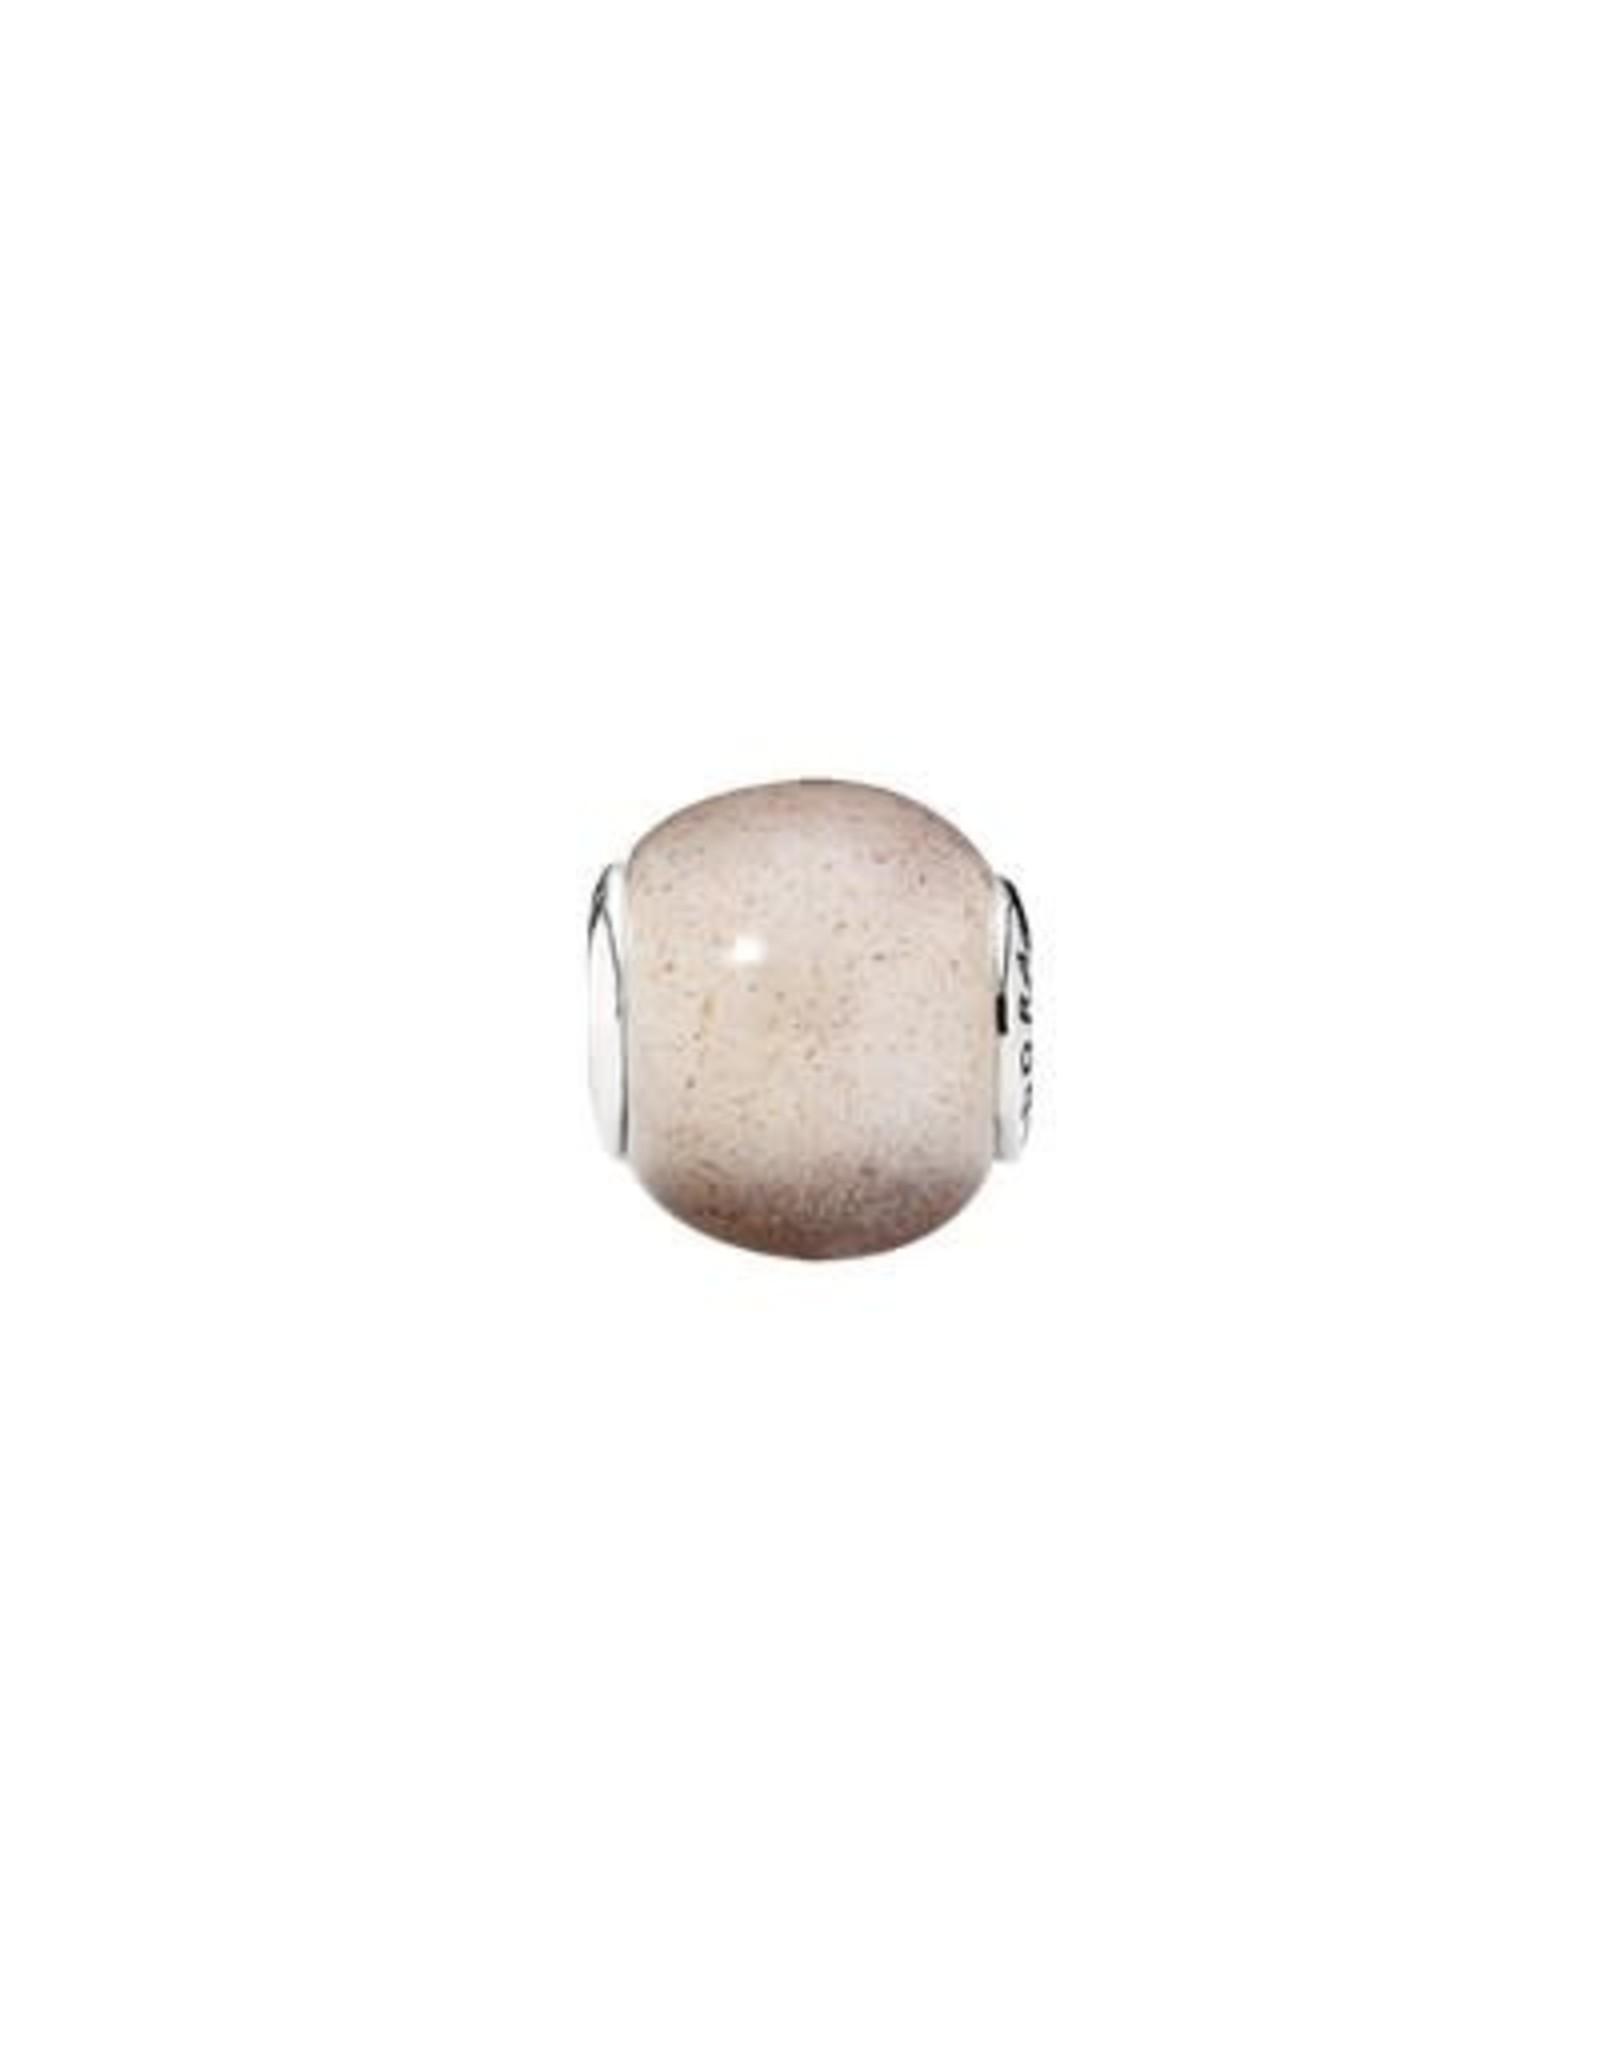 Pandora Pandora Essence Charm, Love, Pink Moonstone